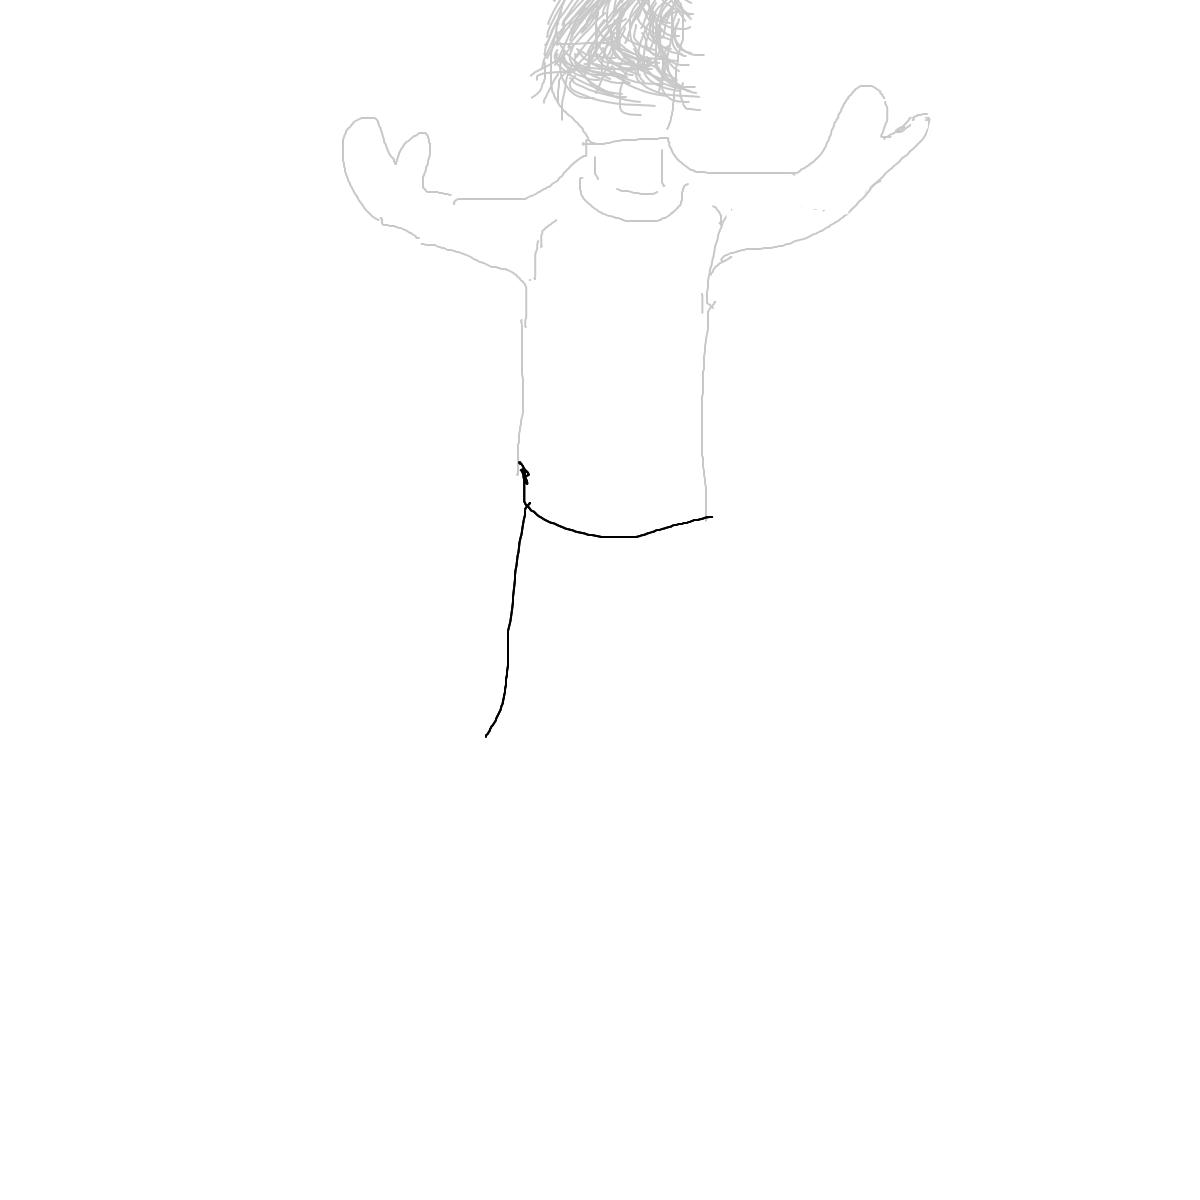 BAAAM drawing#5267 lat:39.9655838012695300lng: -75.1809158325195300